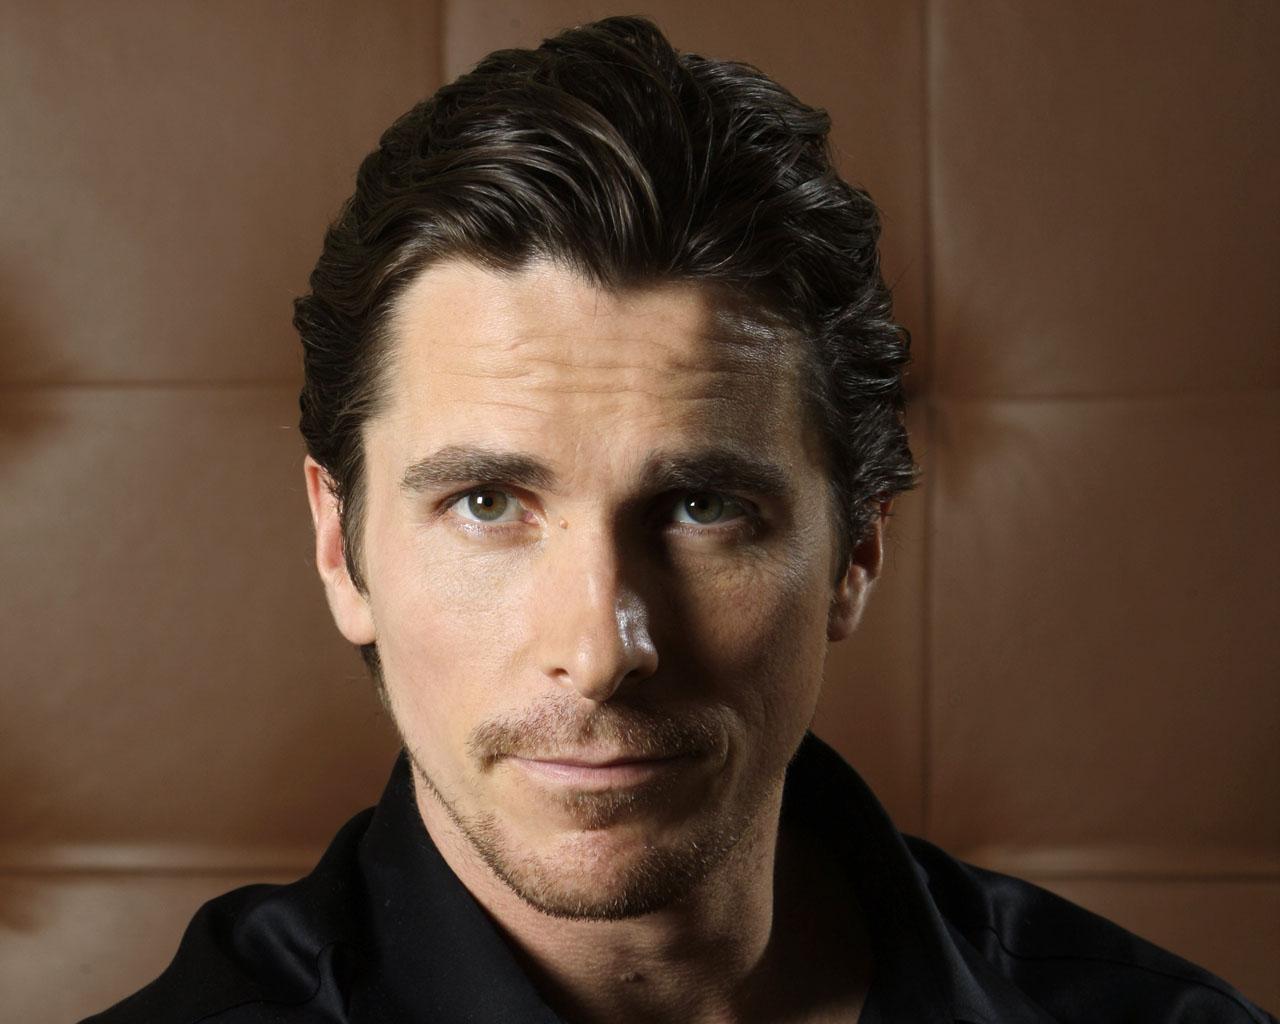 Christian Bale #1